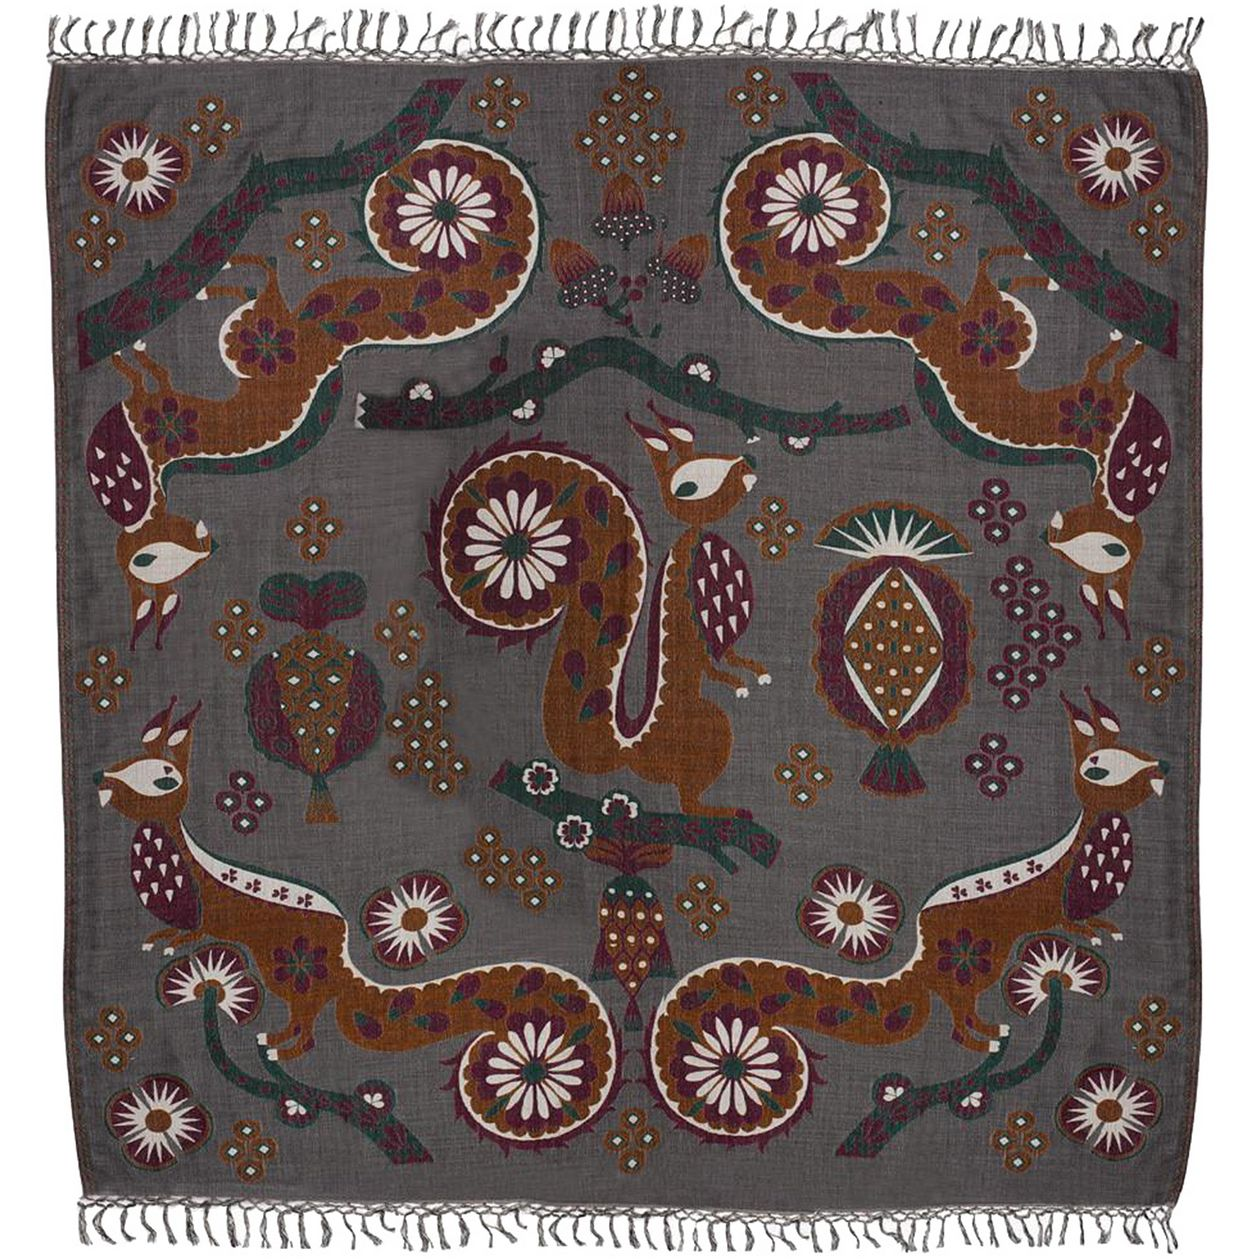 Klaus Haapaniemi Squirrel shawl, 150 x 150 cm, grey